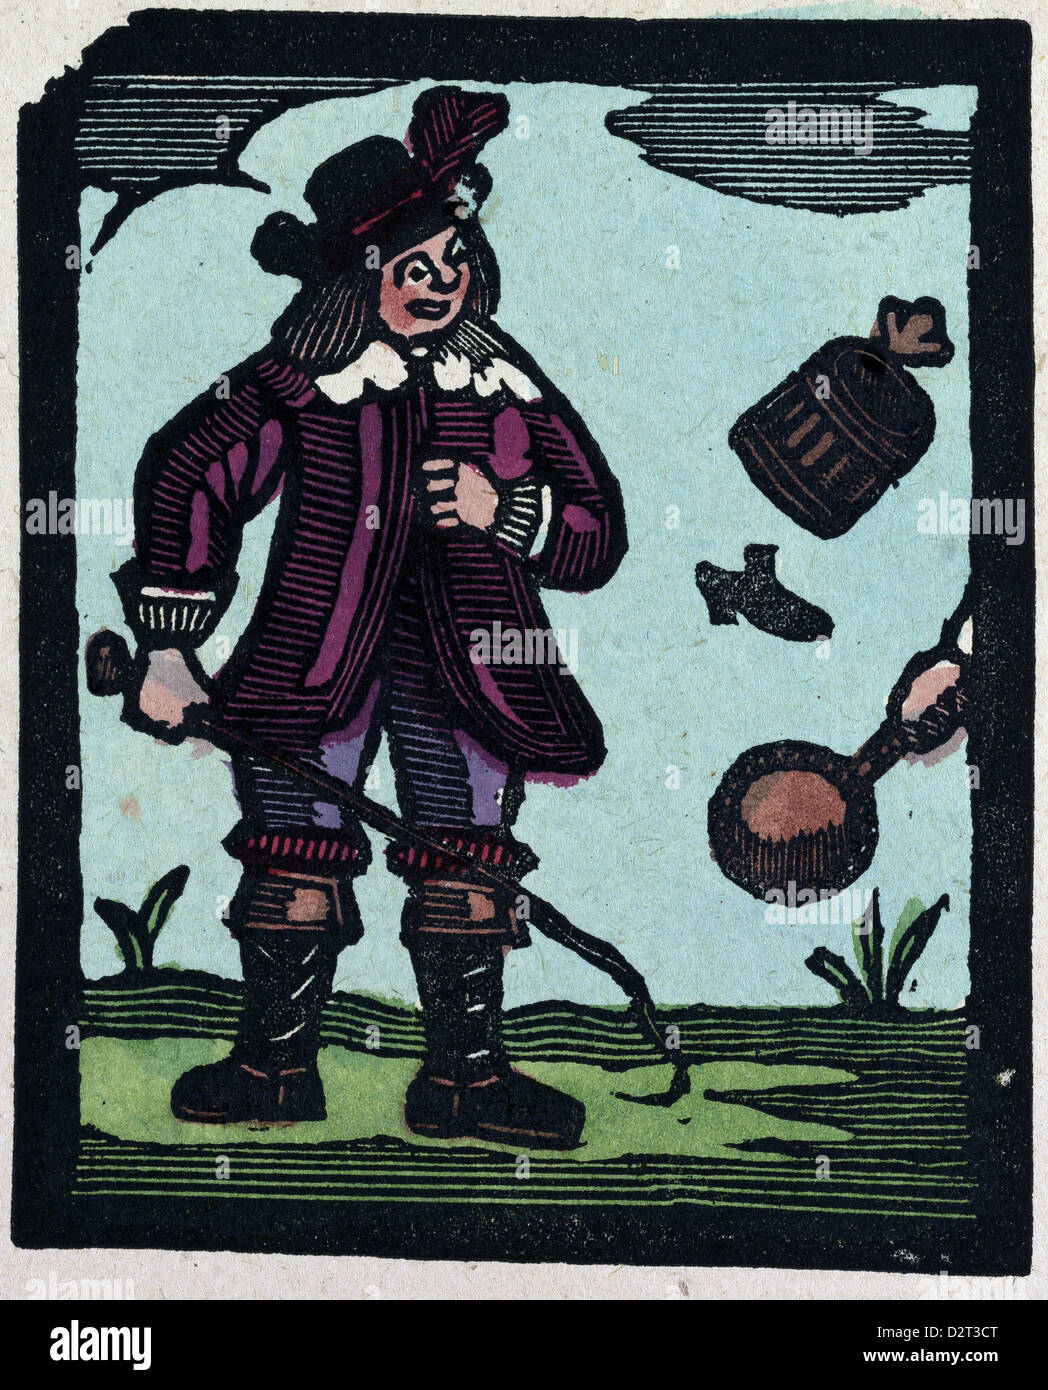 illustration of English tales folk tales and ballads. A man wearing a purple dress - Stock Image